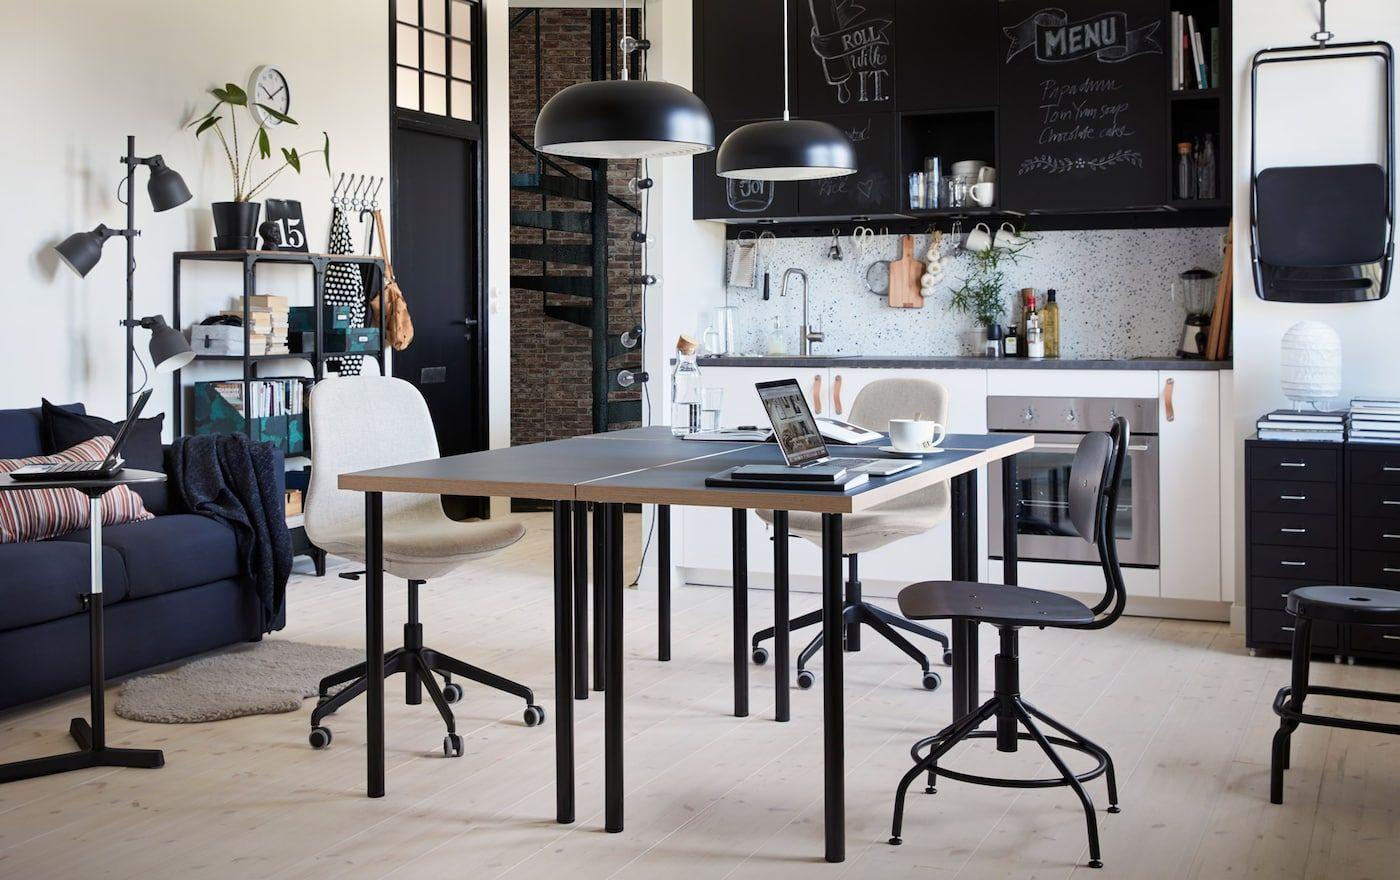 IKEA LINNMON / ALEX Table blackbrown, white Ikea desk